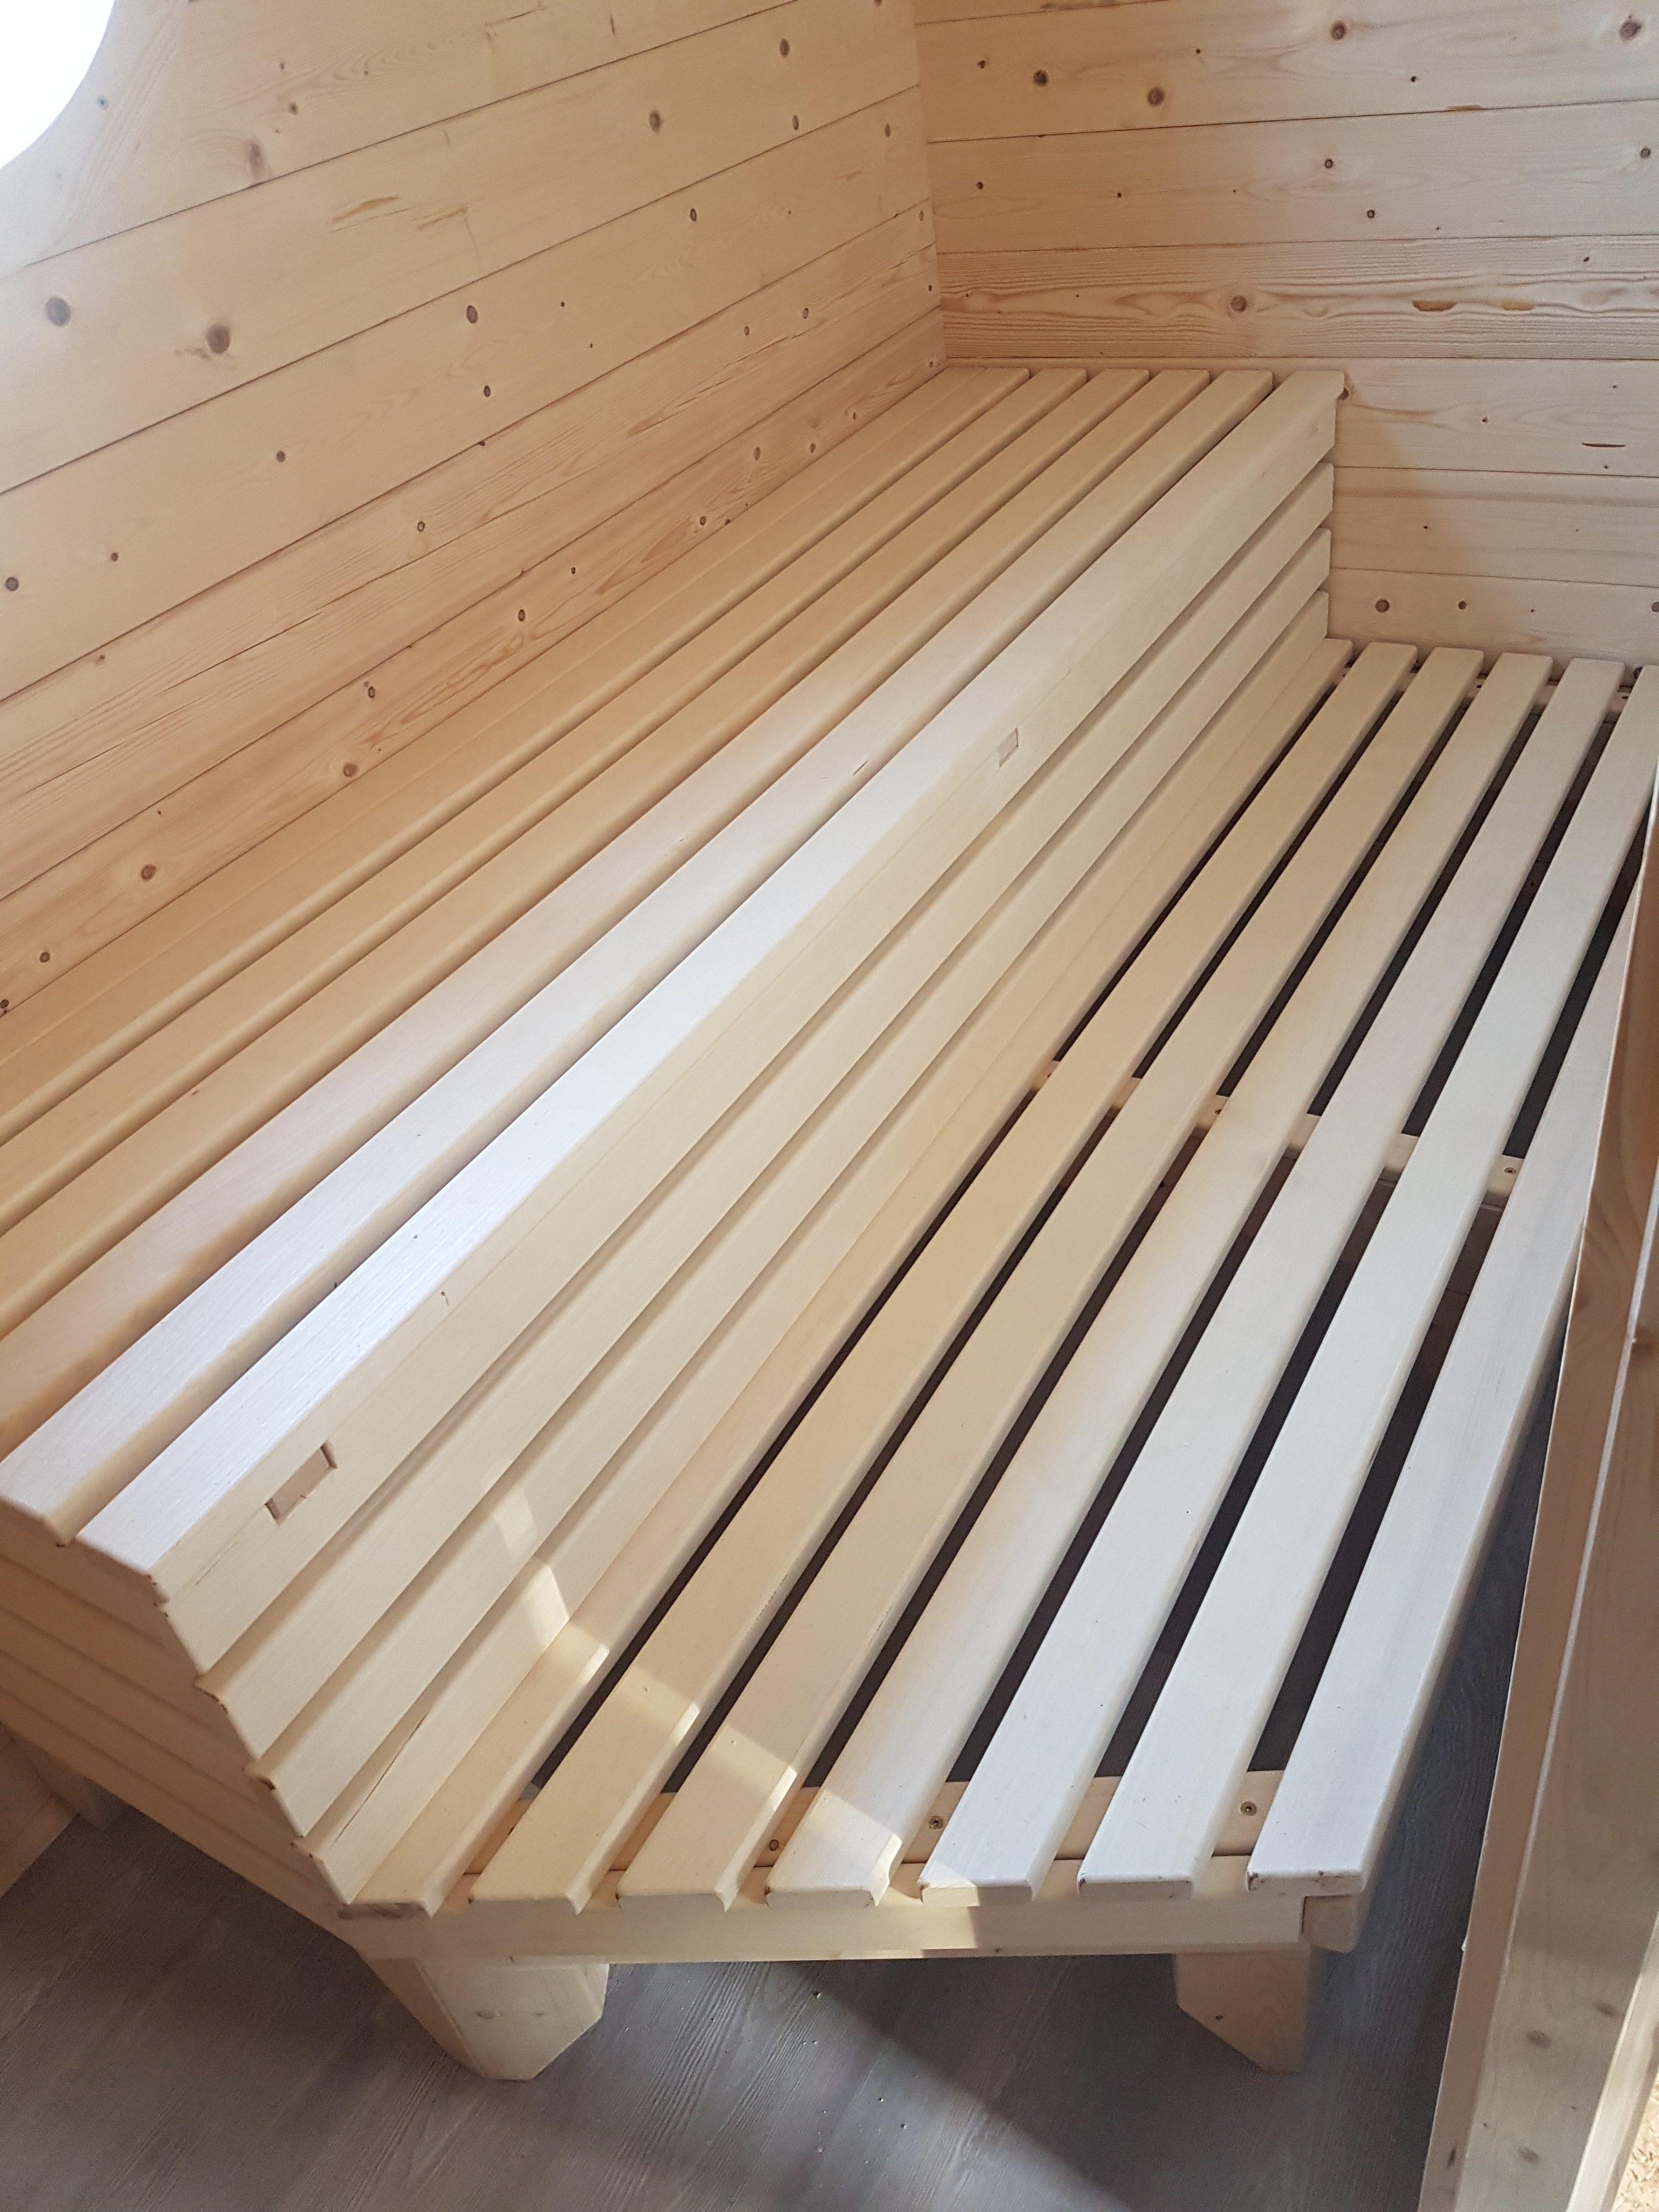 Sauna, Detail, Sitzflächen, Liegeflächen